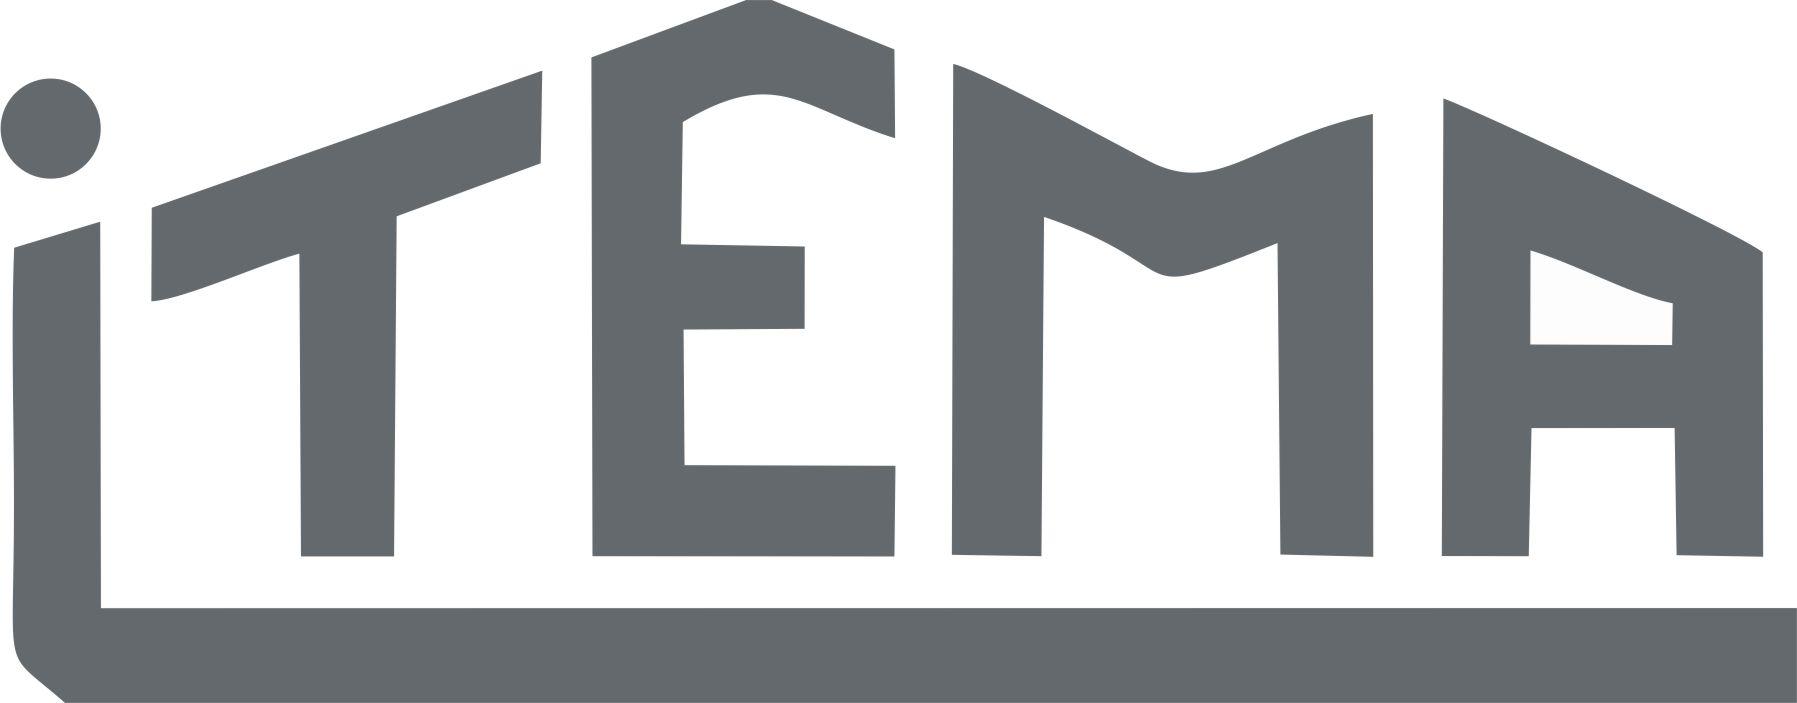 ITEMA Logo 06 2016